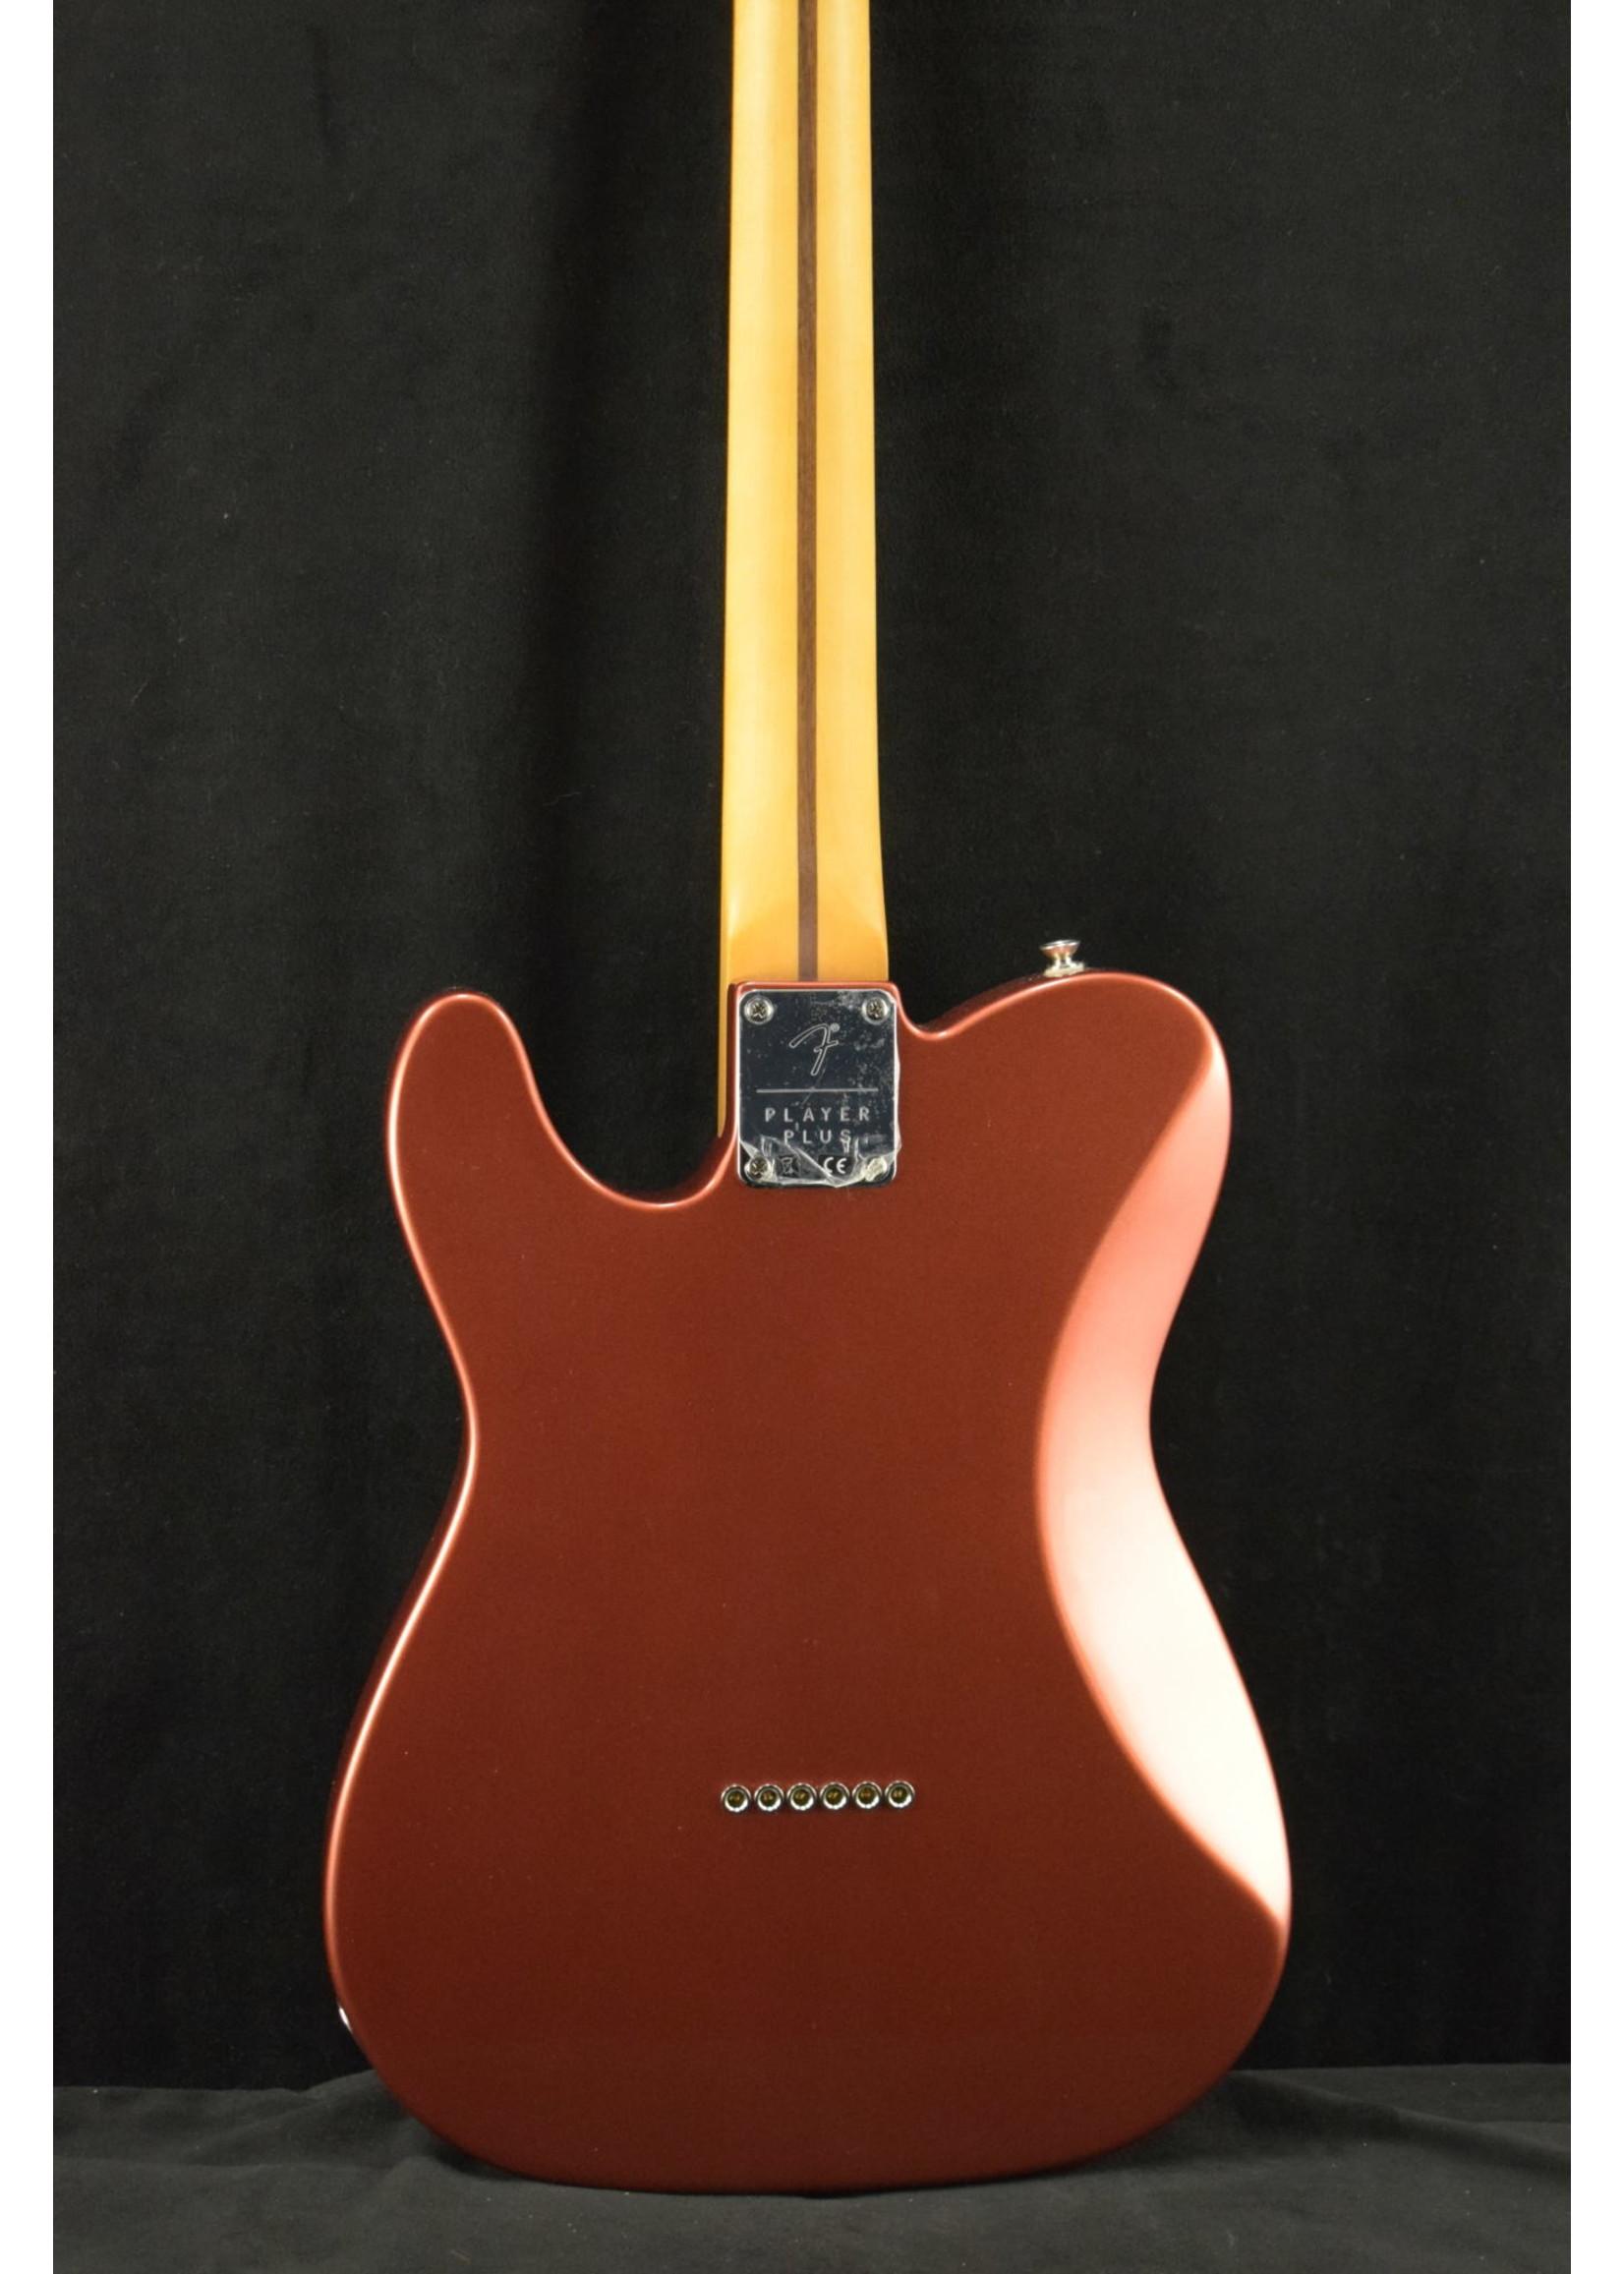 Fender Fender Player Plus Nashville Telecaster Pau Ferro Fingerboard Aged Candy Apple Red